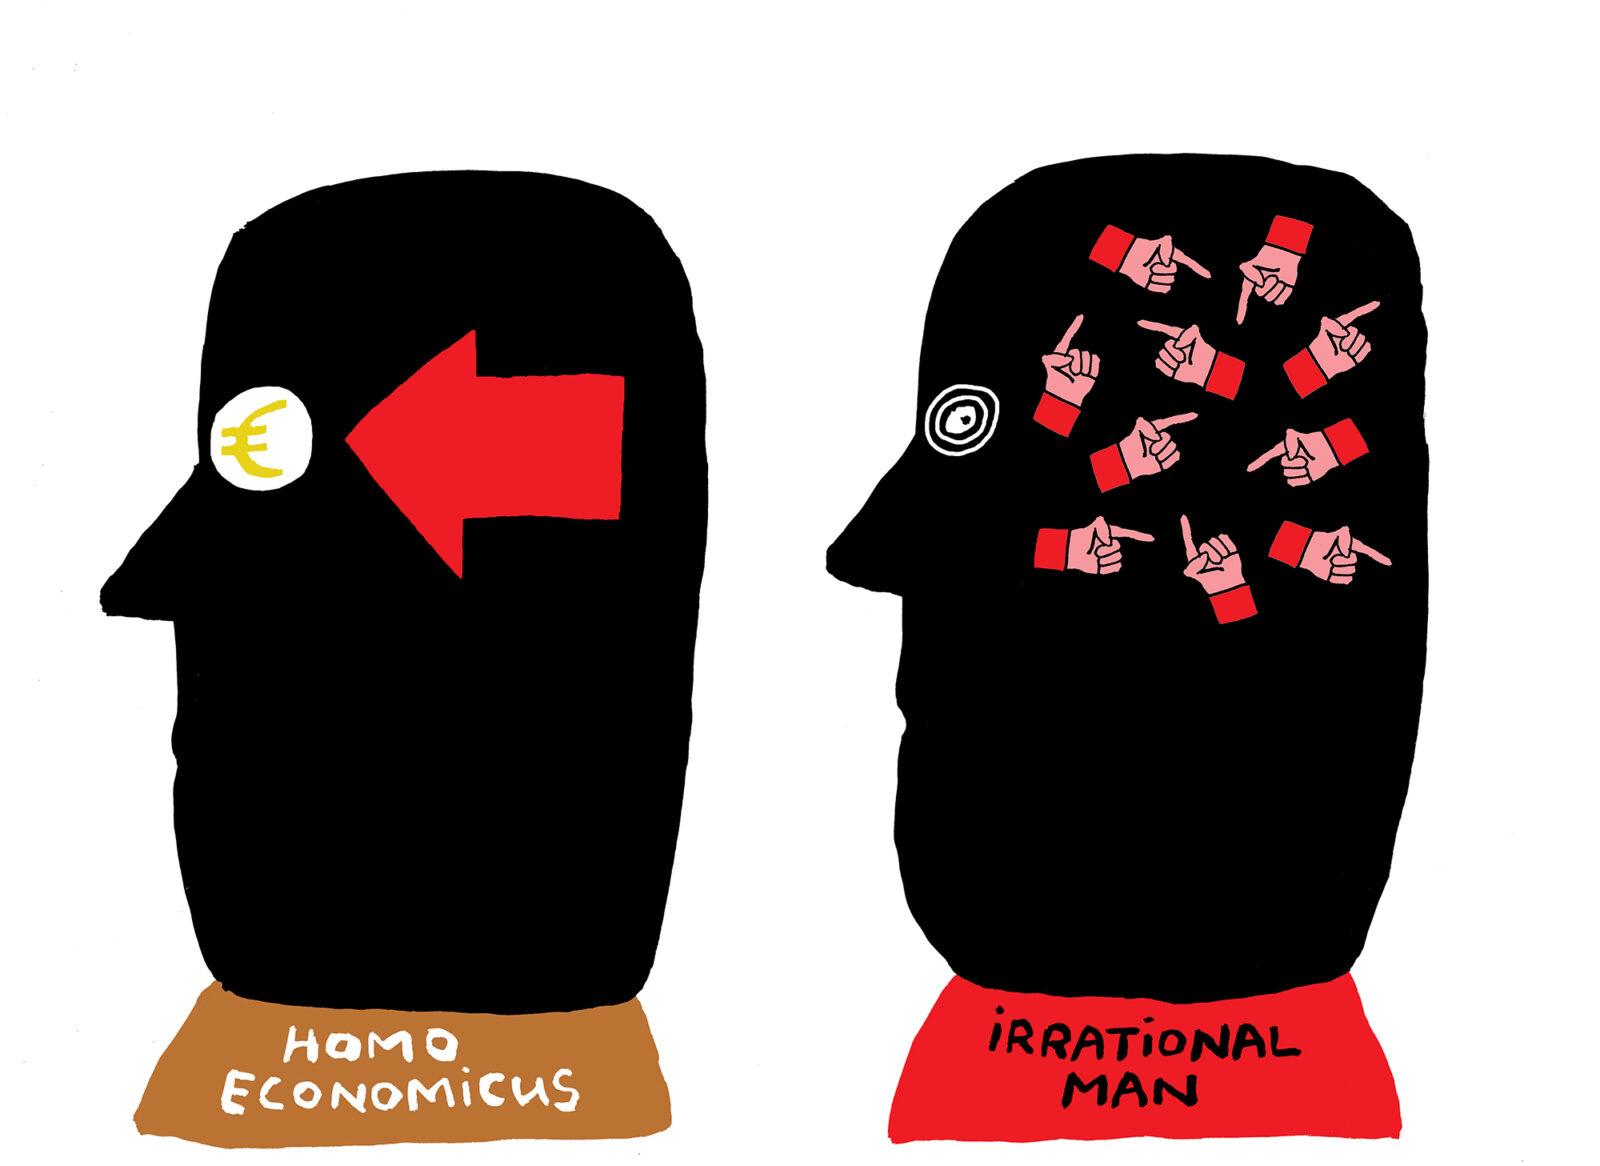 em-homo economicus irrational man-Bas van der Schot